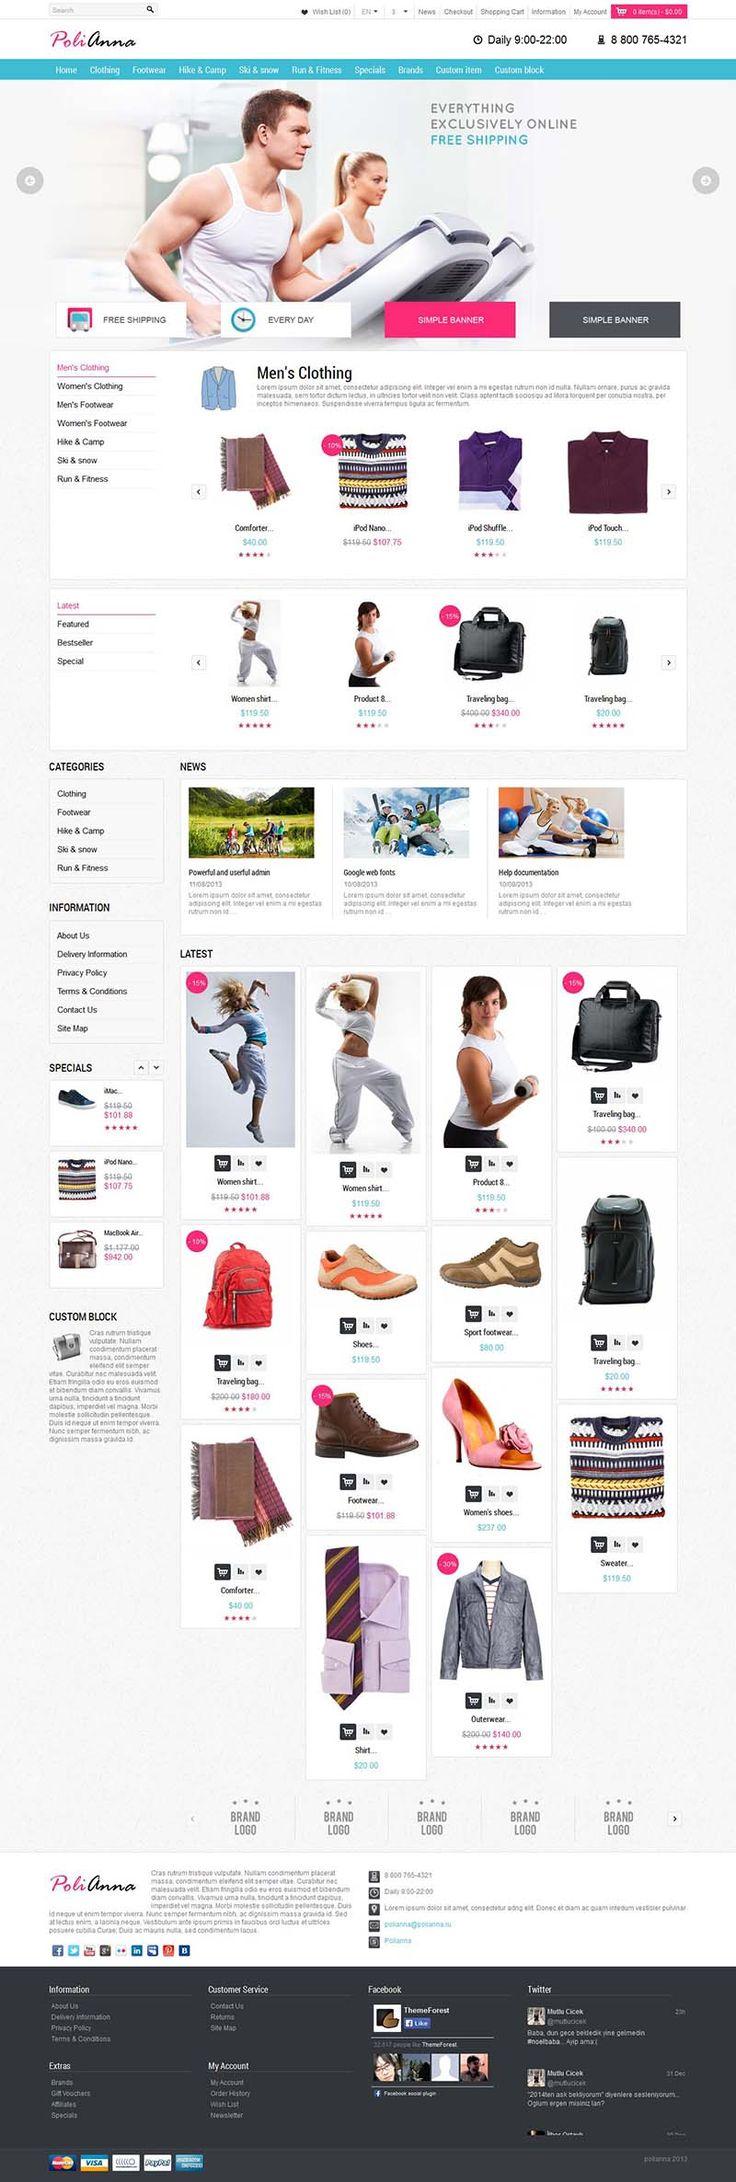 Polianna - Responsive #OpenCart Fashion Store Theme http://www.themesandmods.com/opencart/polianna/